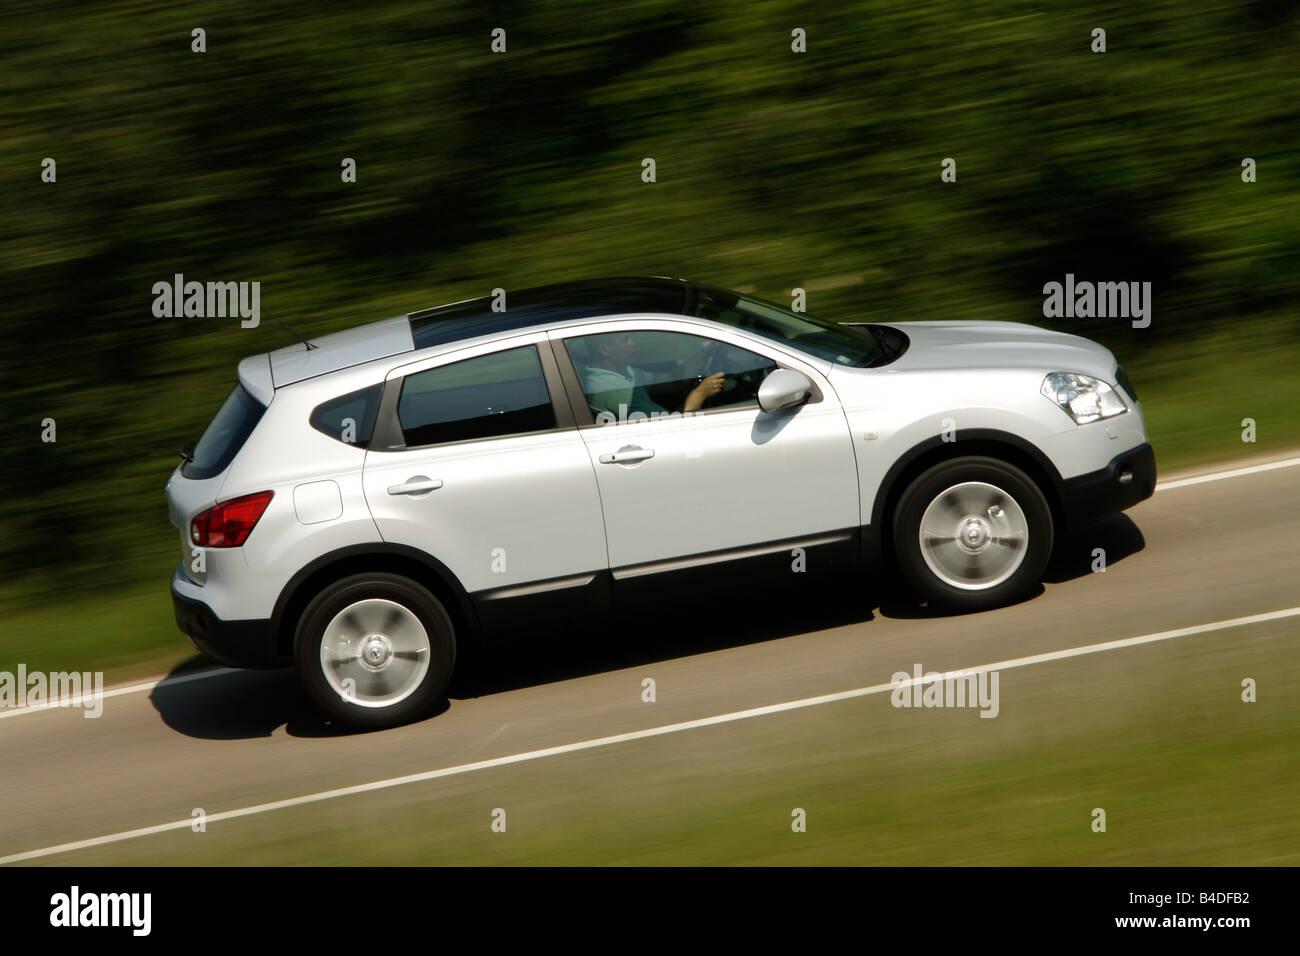 Nissan Qashqai 2.0 4WD tekna, model year 2007-, silver, driving ...